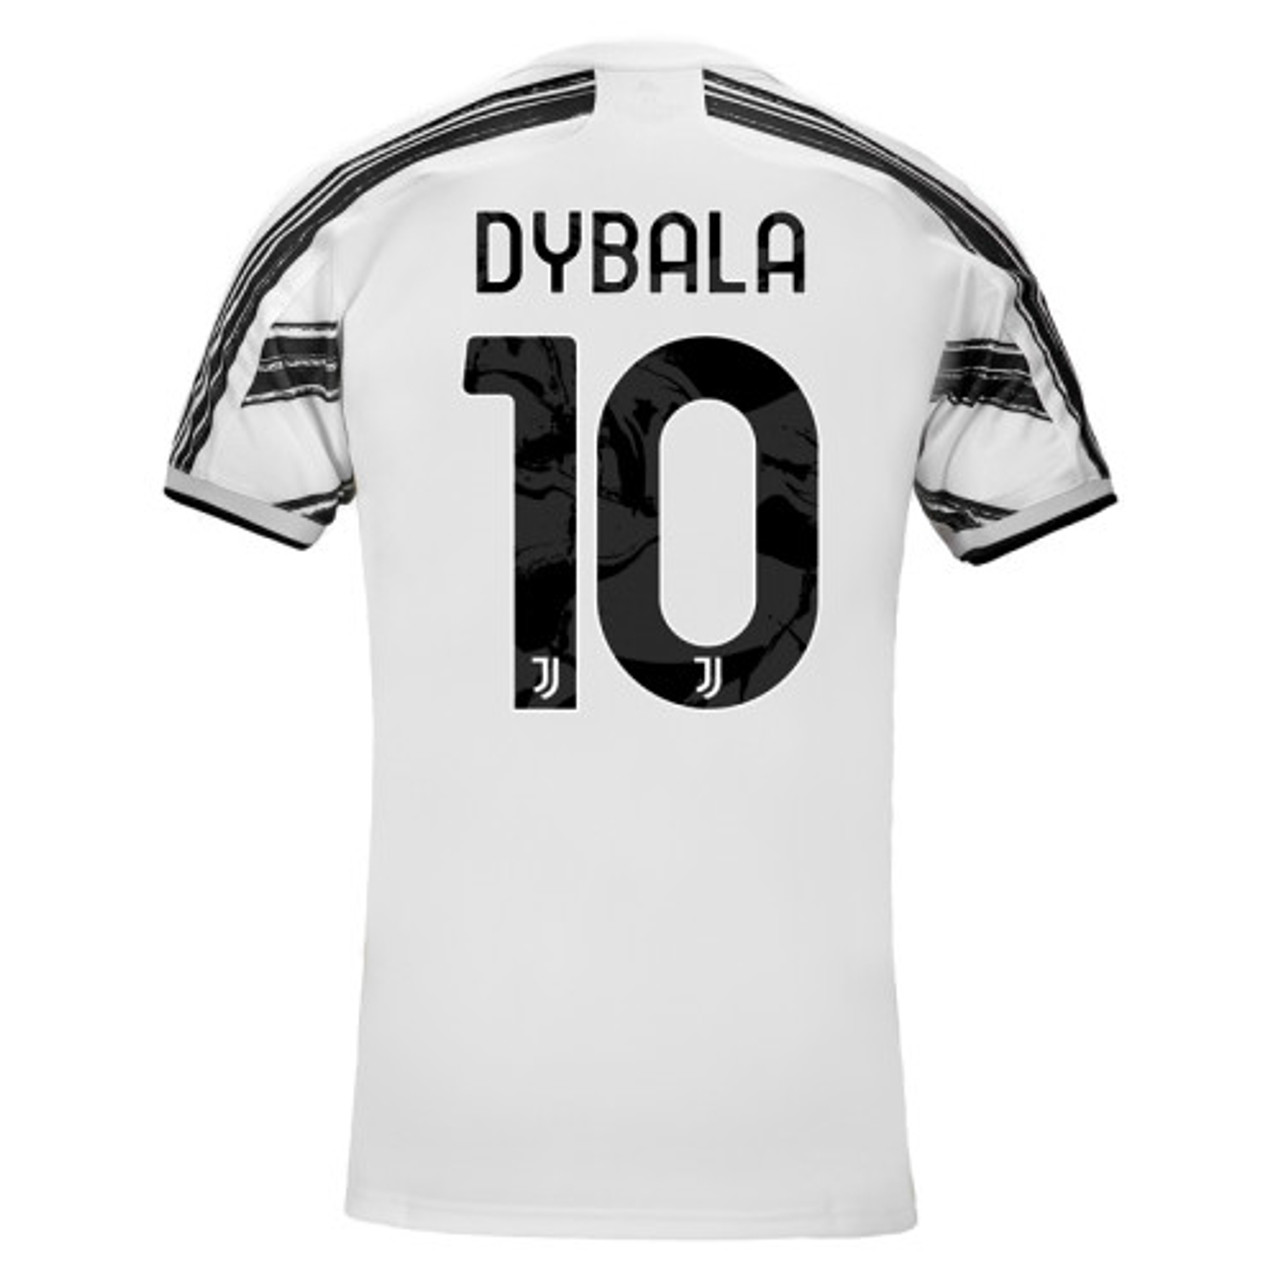 adidas juventus 2021 dybala home jersey soccer plus adidas juventus 2021 dybala home jersey